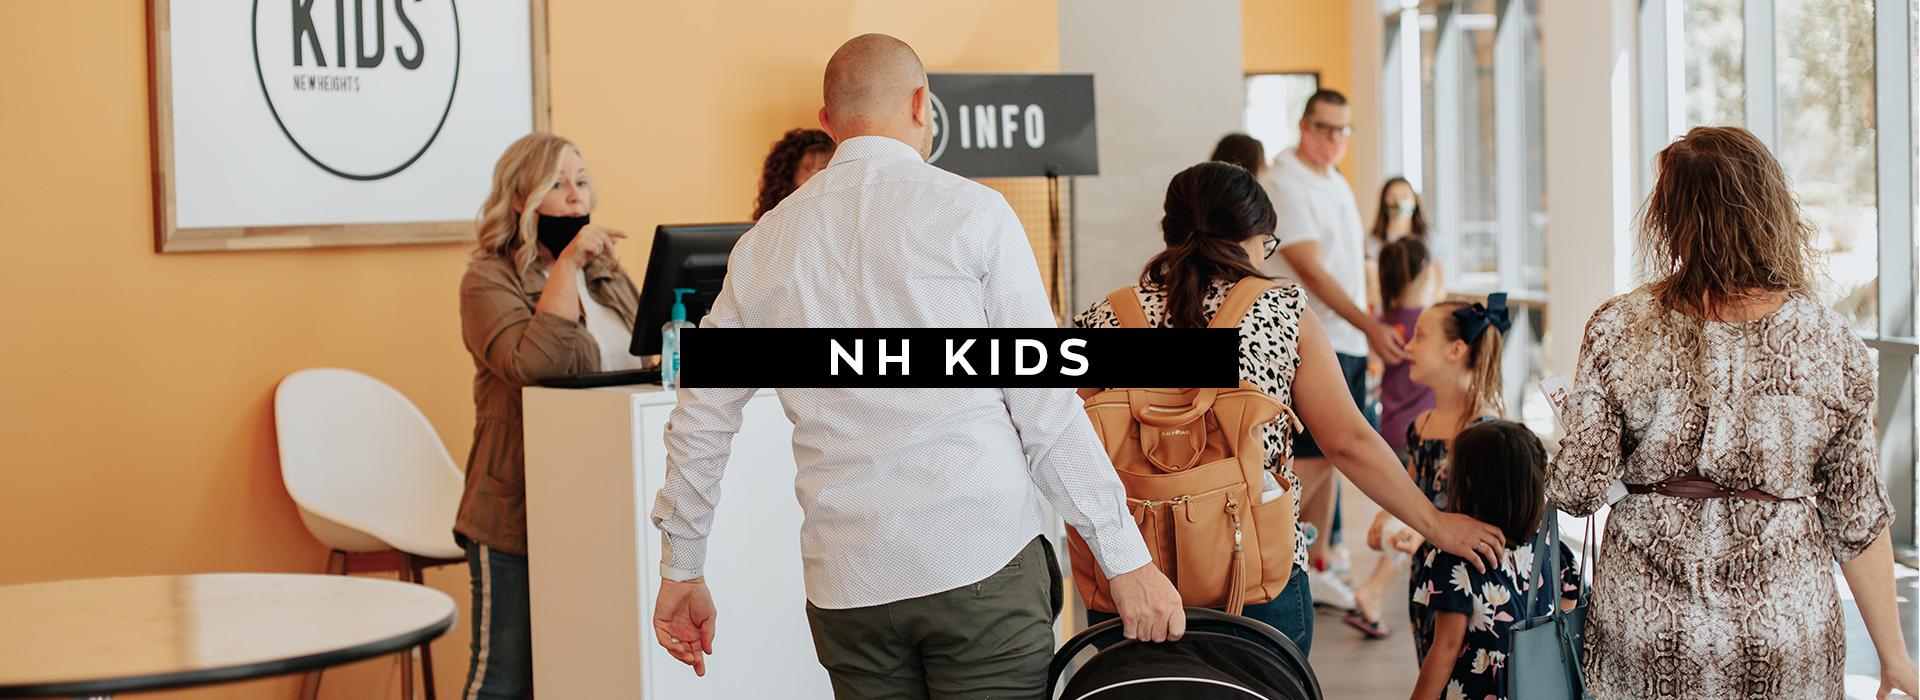 NH Kids Banner copy